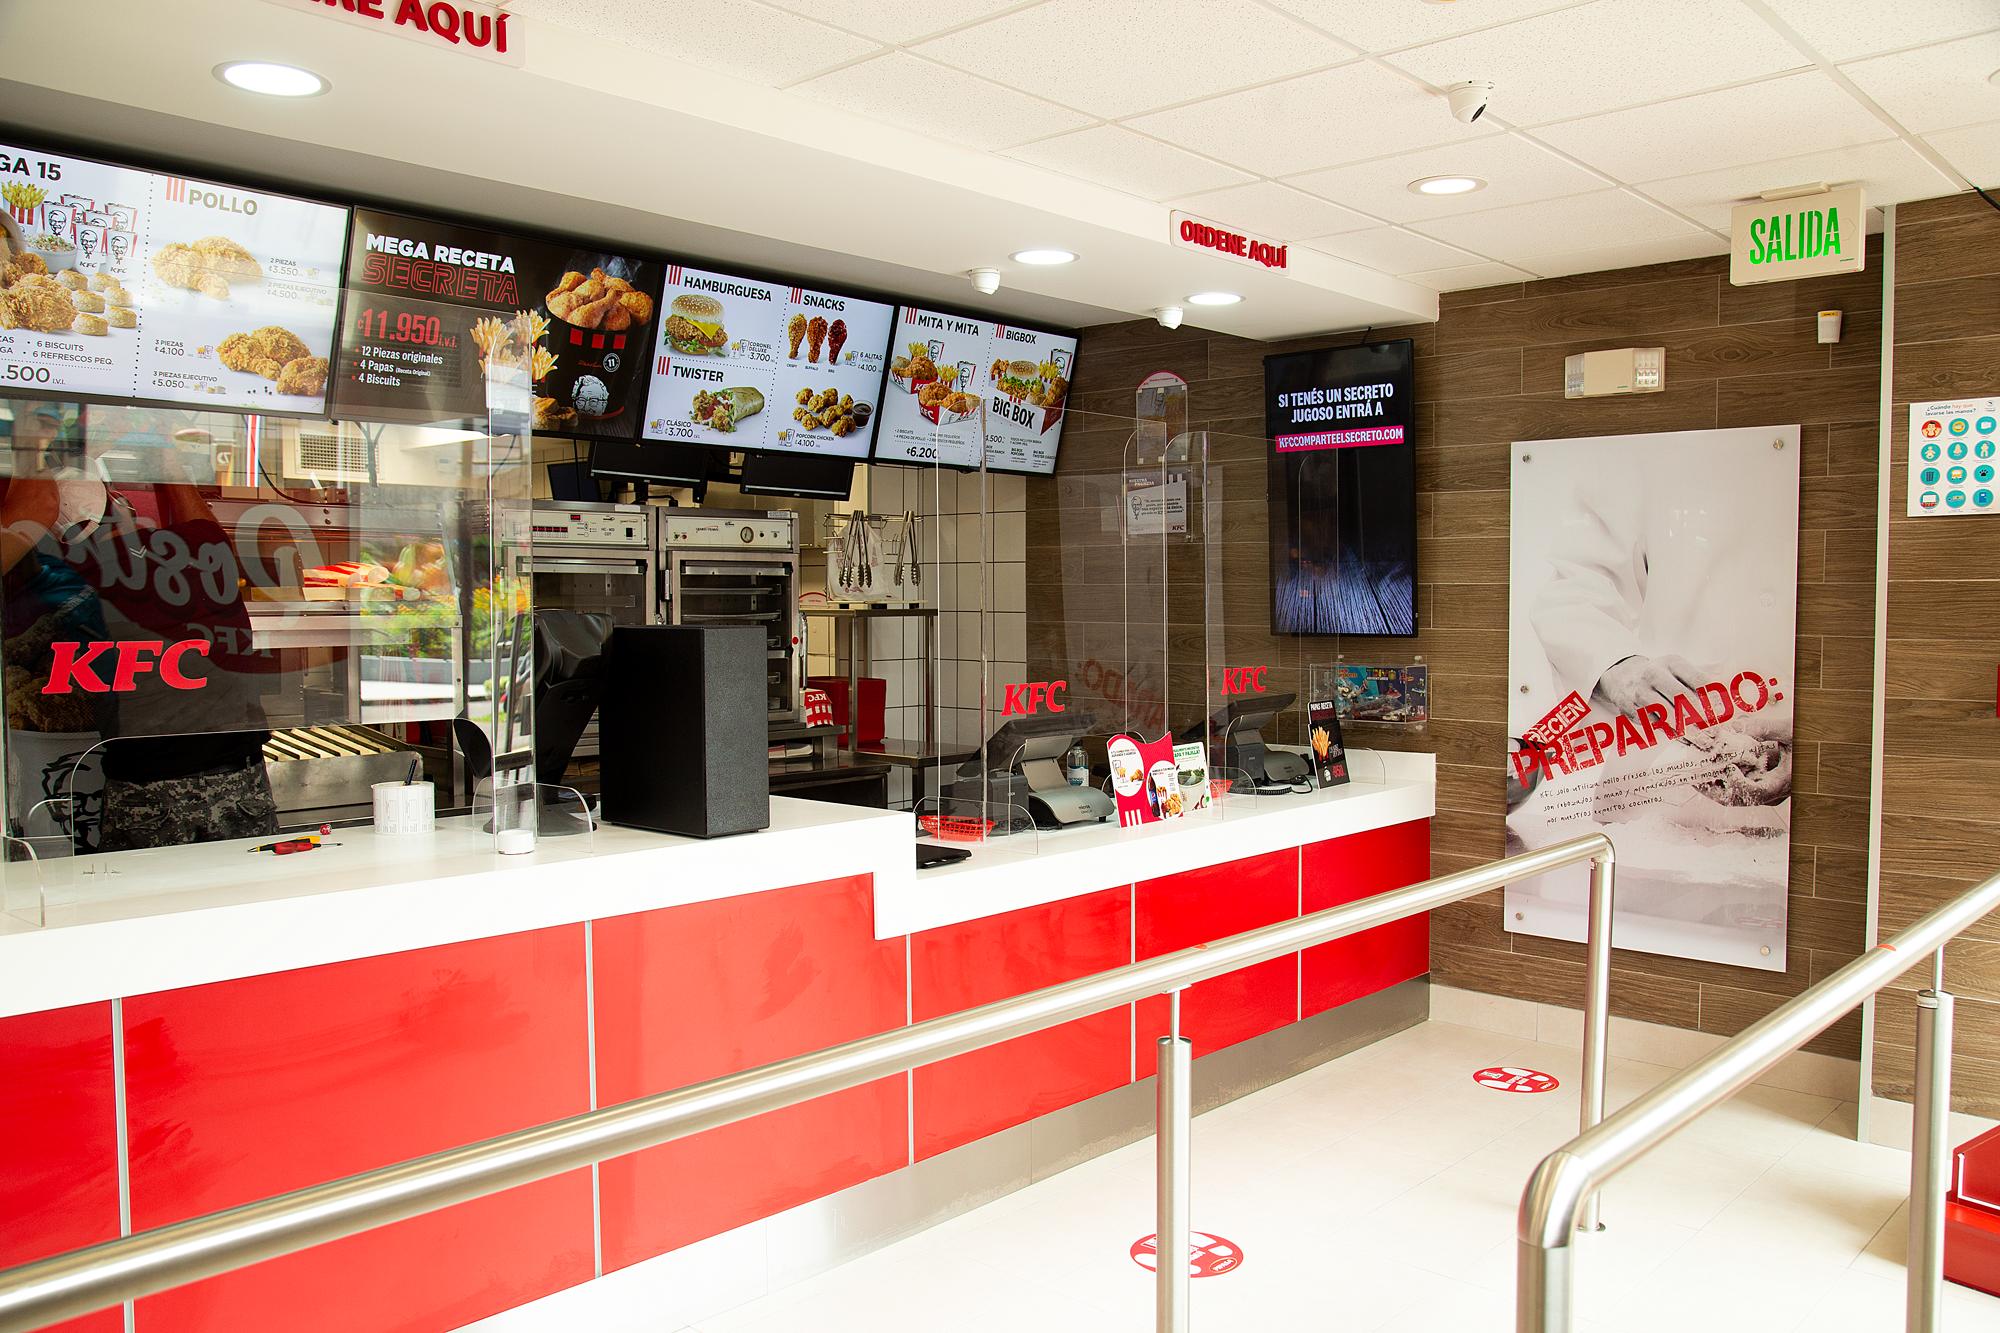 KFC abre un restaurante en San José Centro